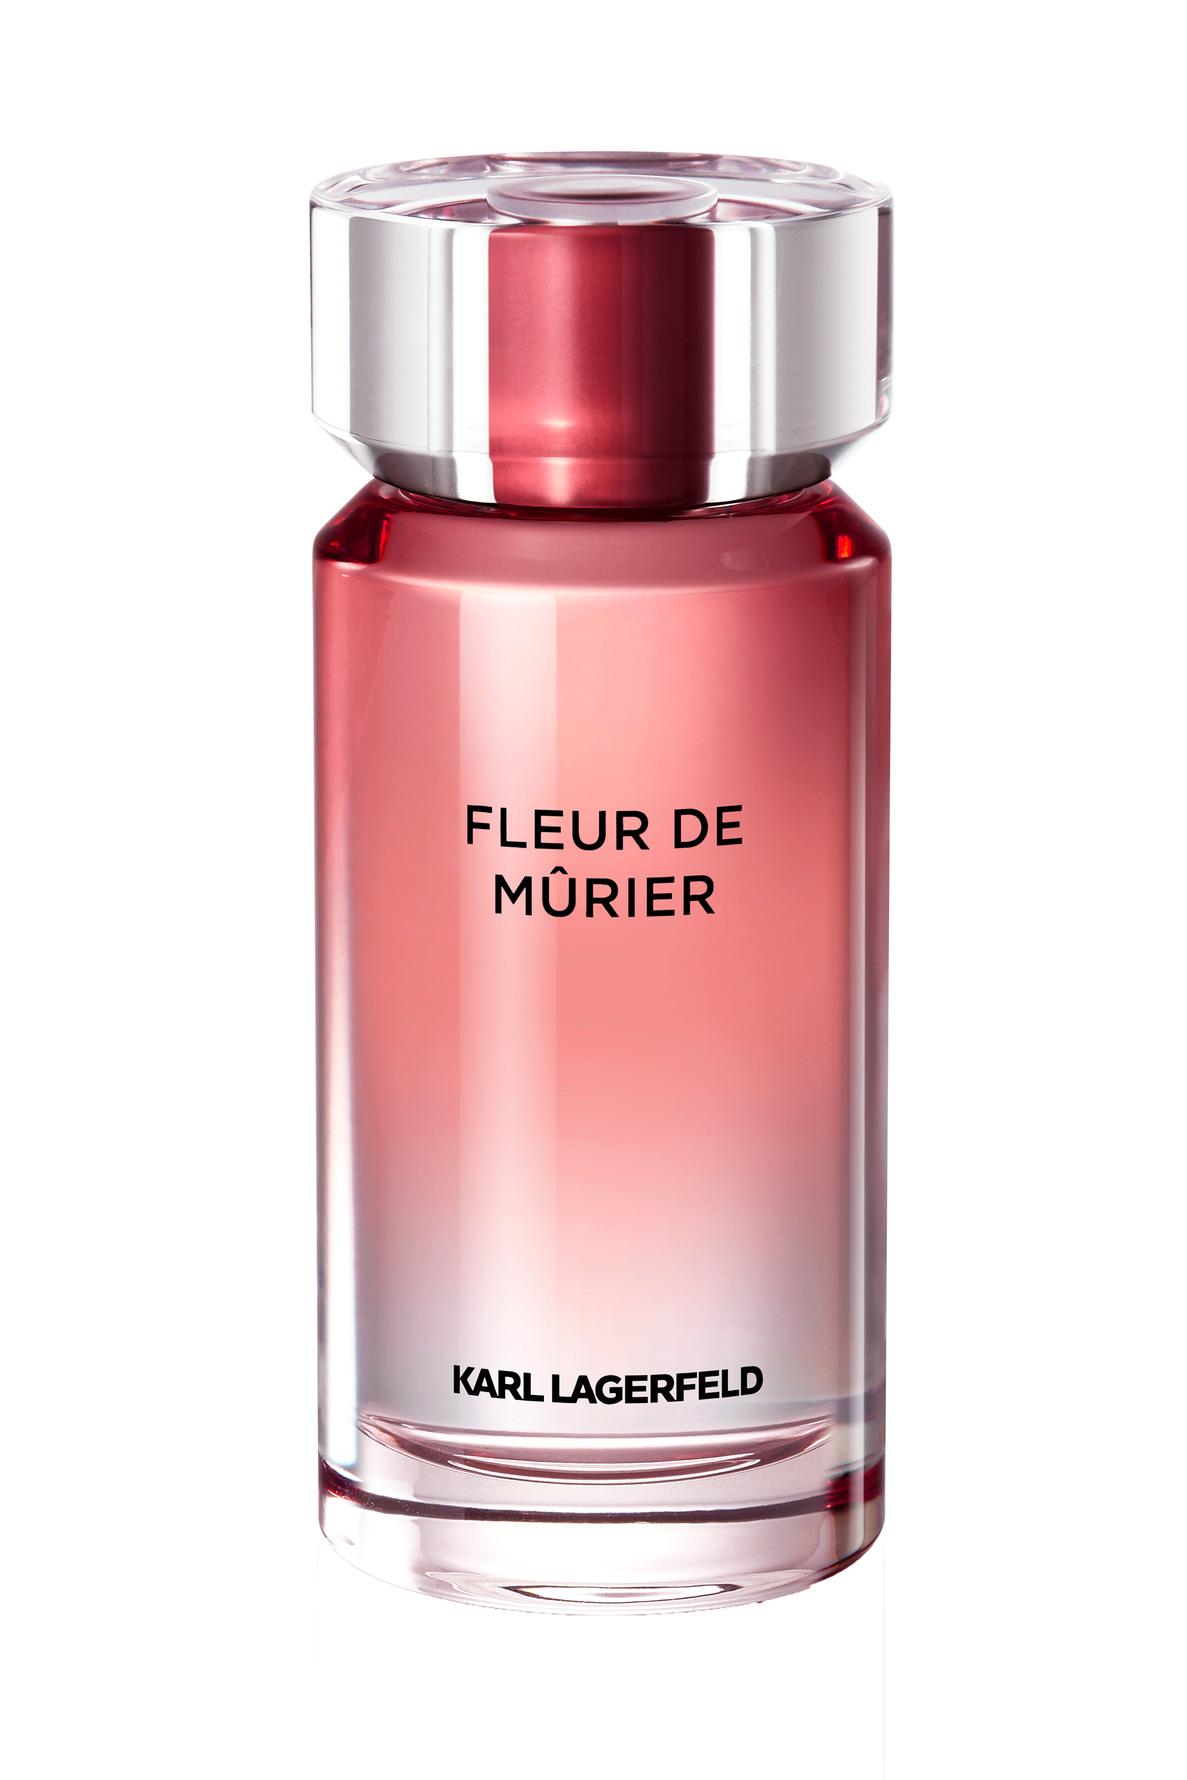 Parfum 100 Fleur Eau Karl De Ml Lagerfeld Mûrier rCxQdWBoe